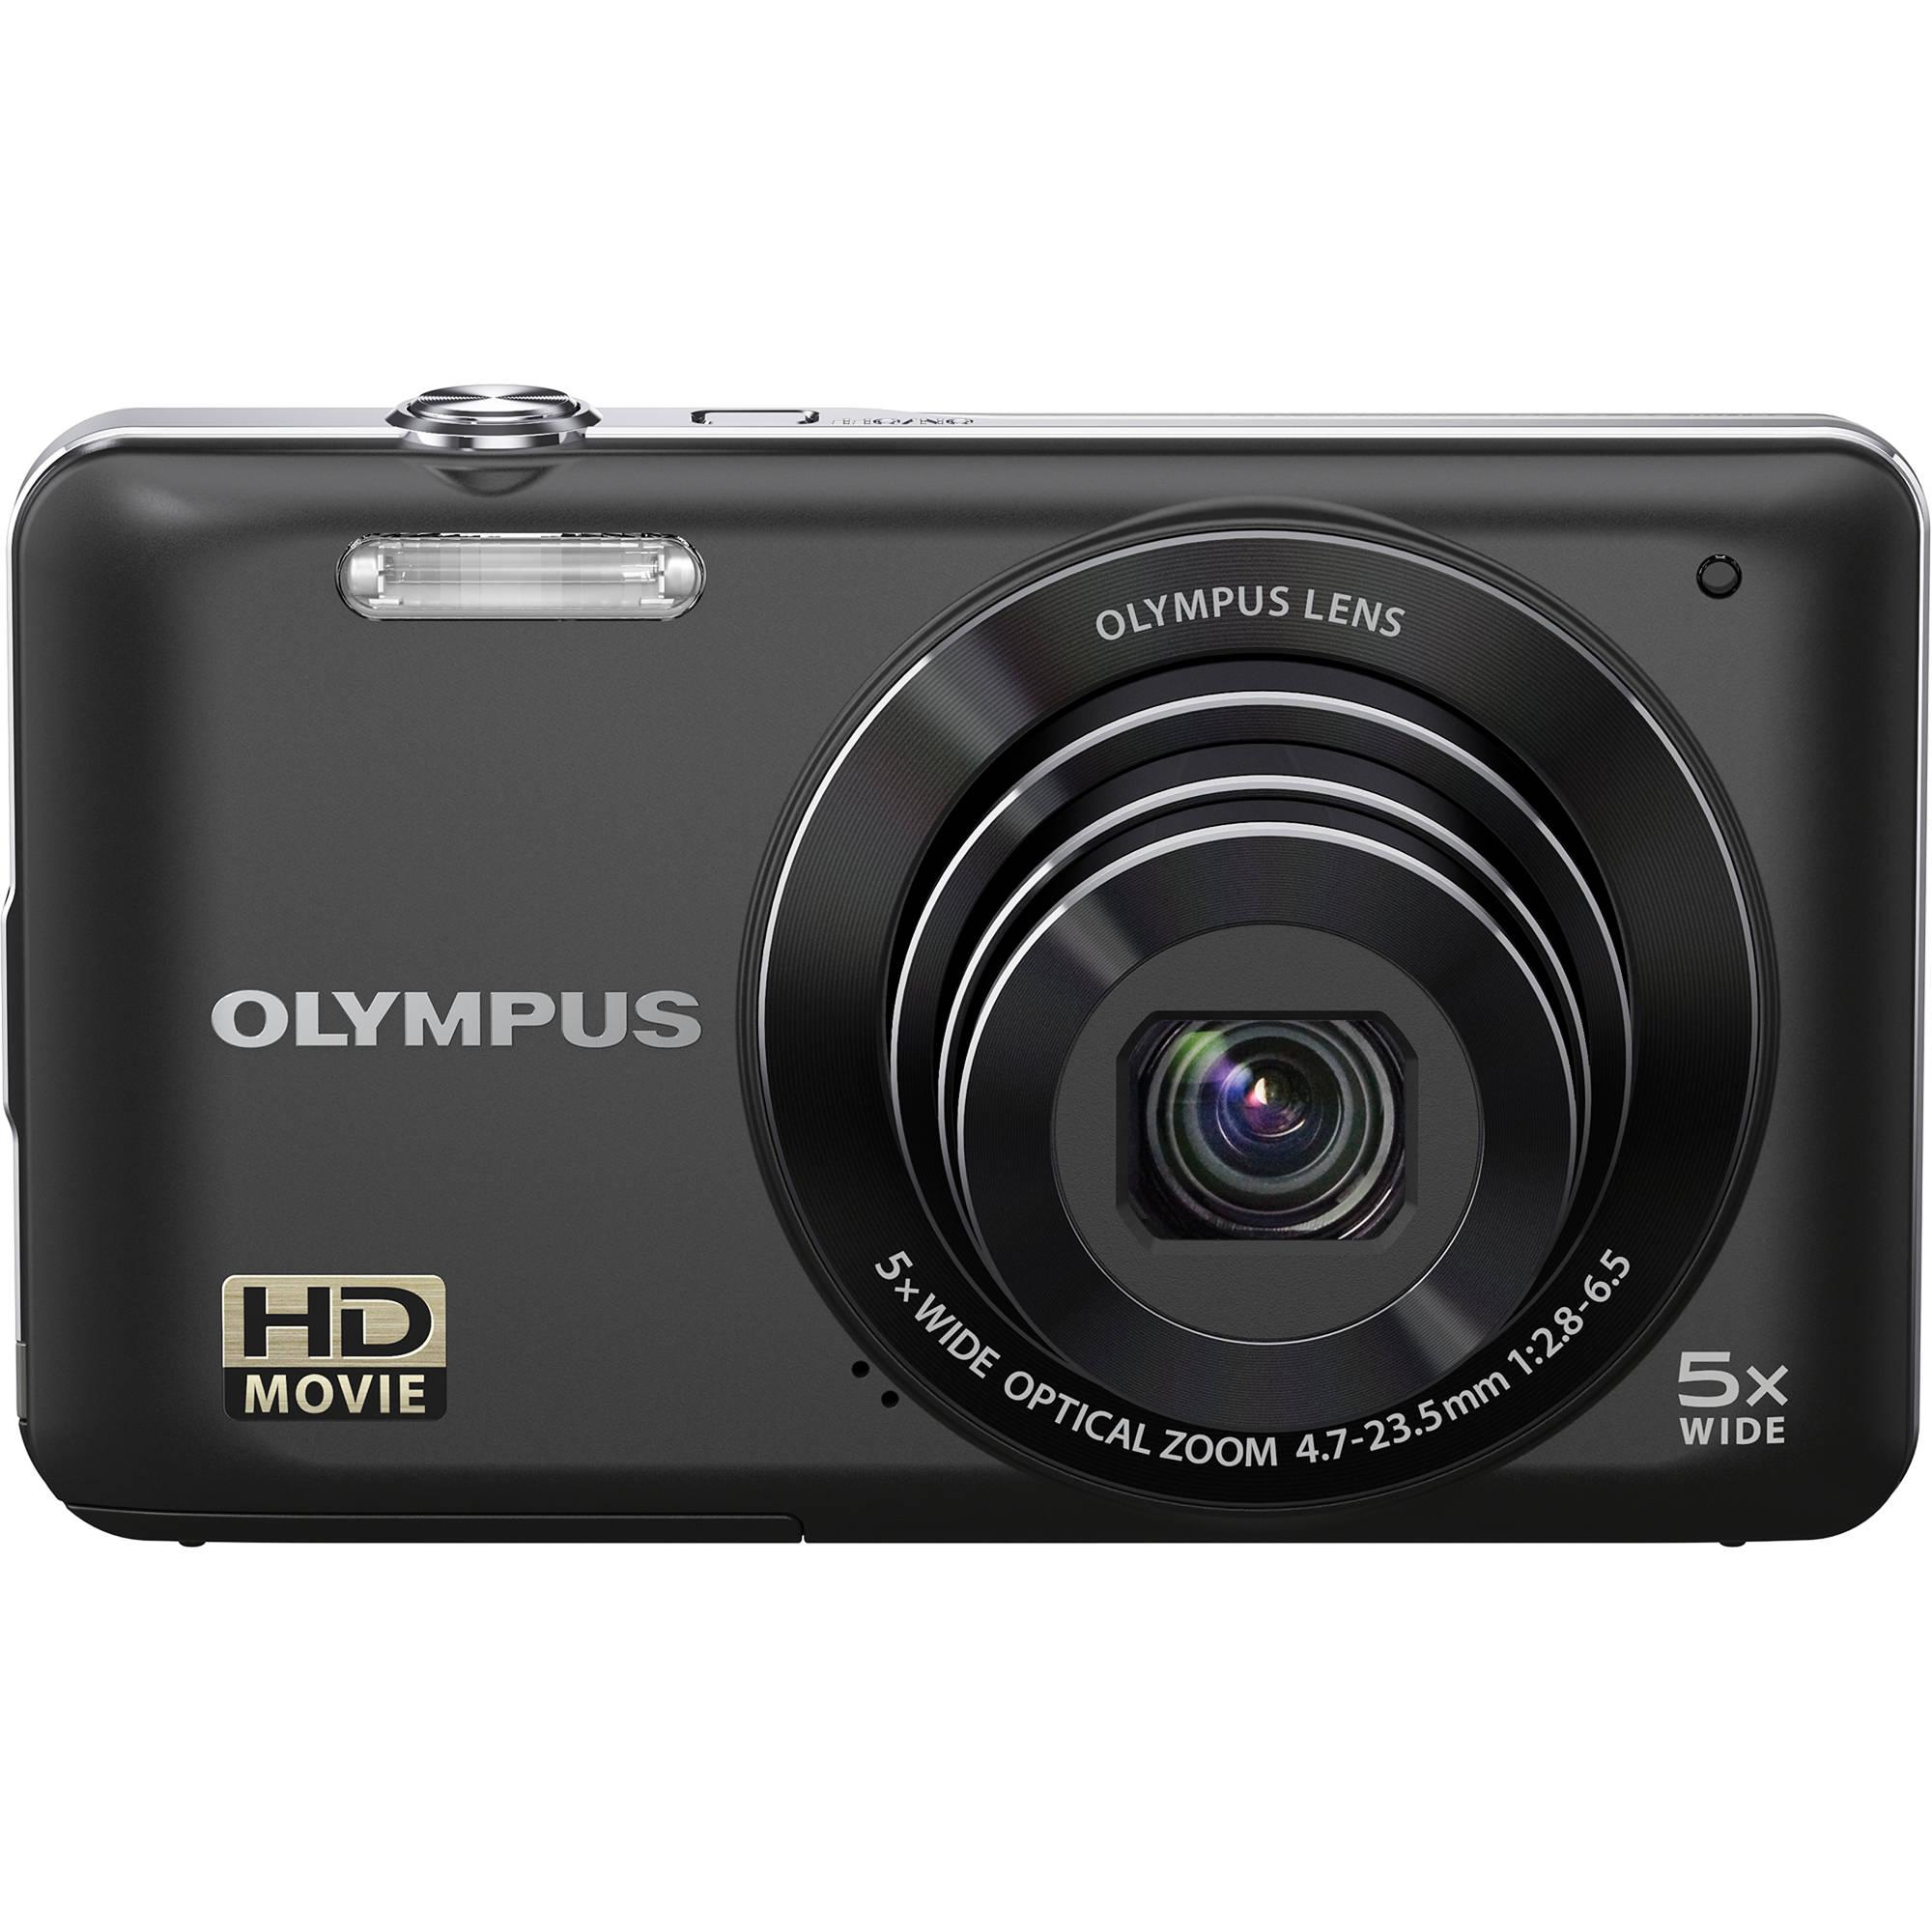 Olympus Digital Camera: Olympus VG-120 Digital Camera (Black) 228180 B&H Photo Video